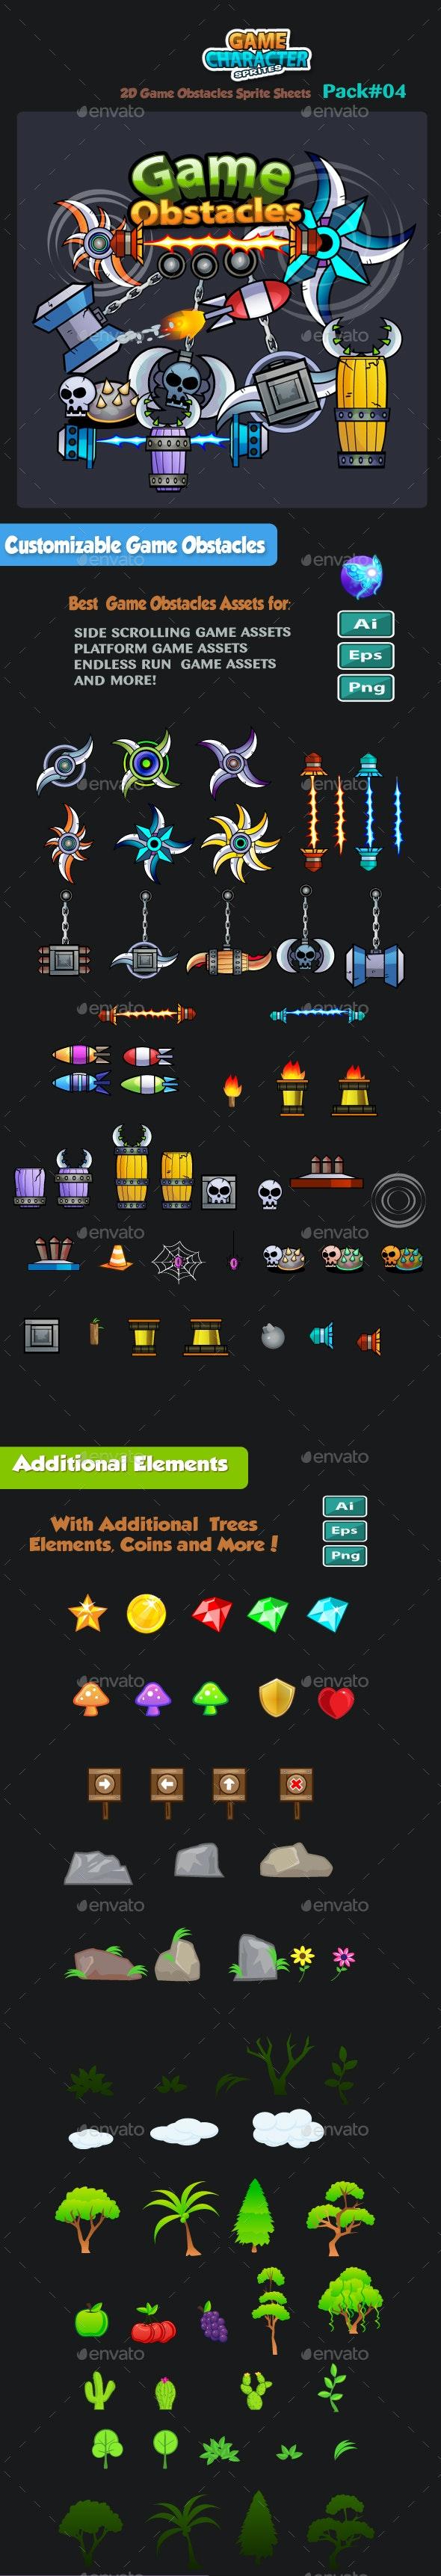 2D Game Obstacles 04 - Sprites Game Assets